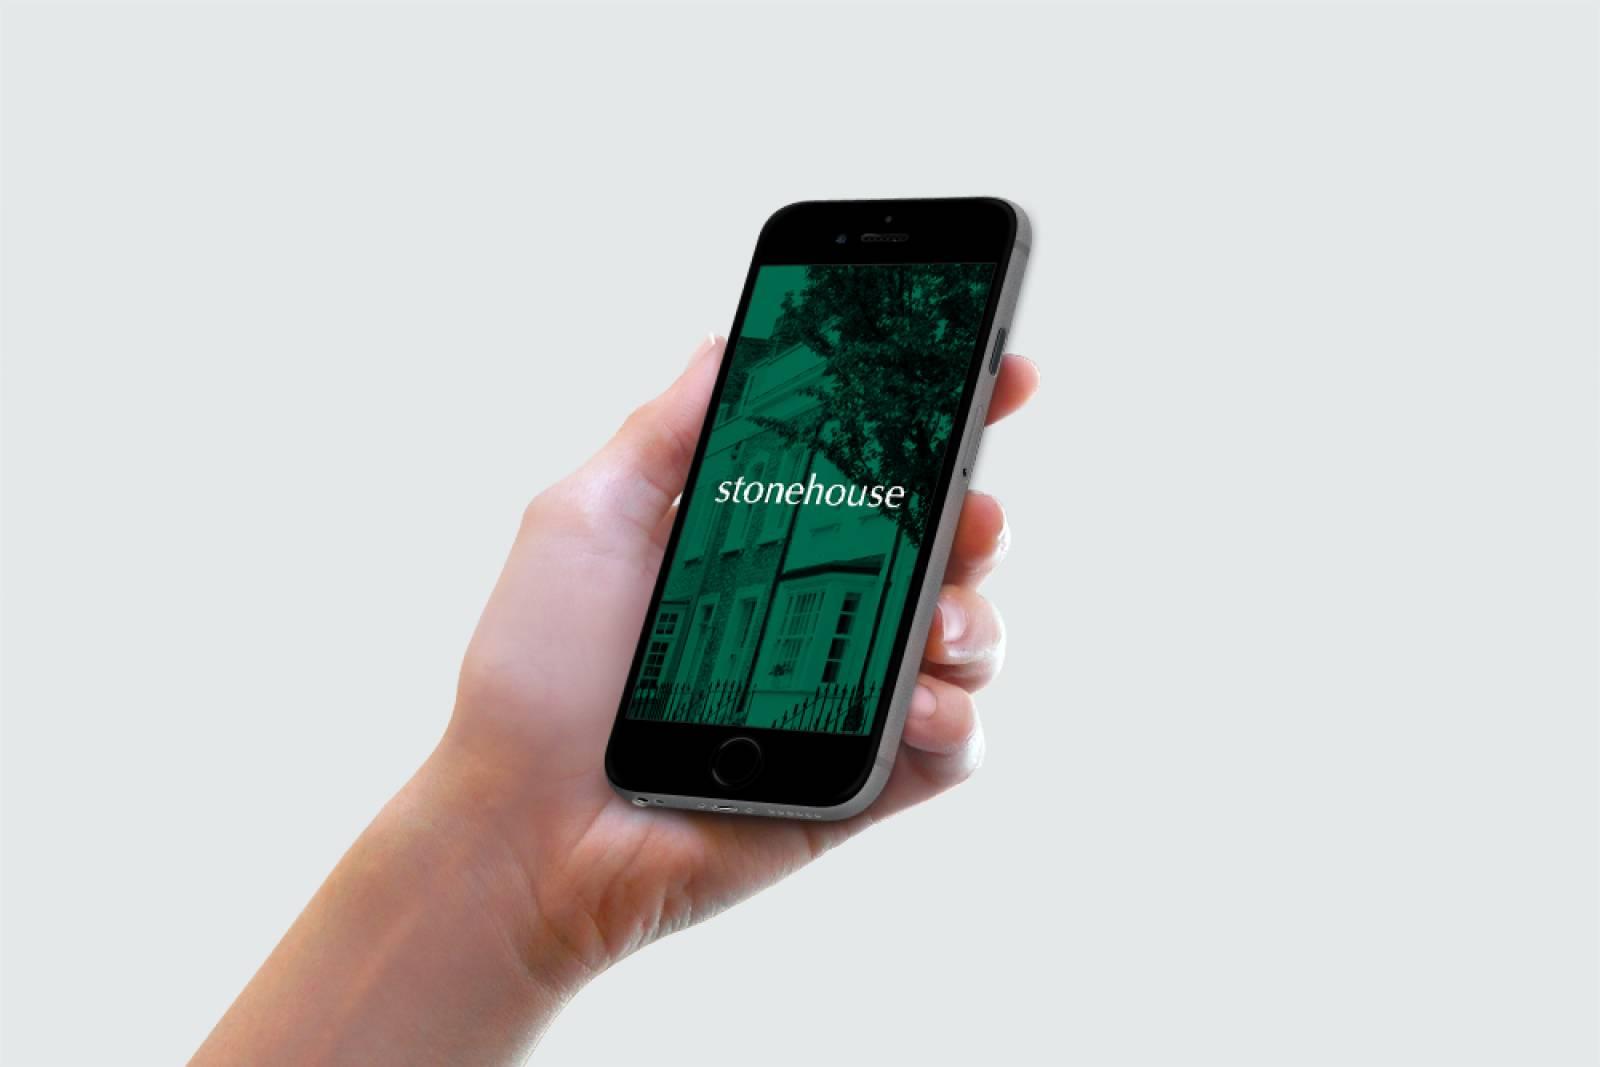 App-Stonehouse-2-ui-design-agency-graphic-design-canterbury.jpg